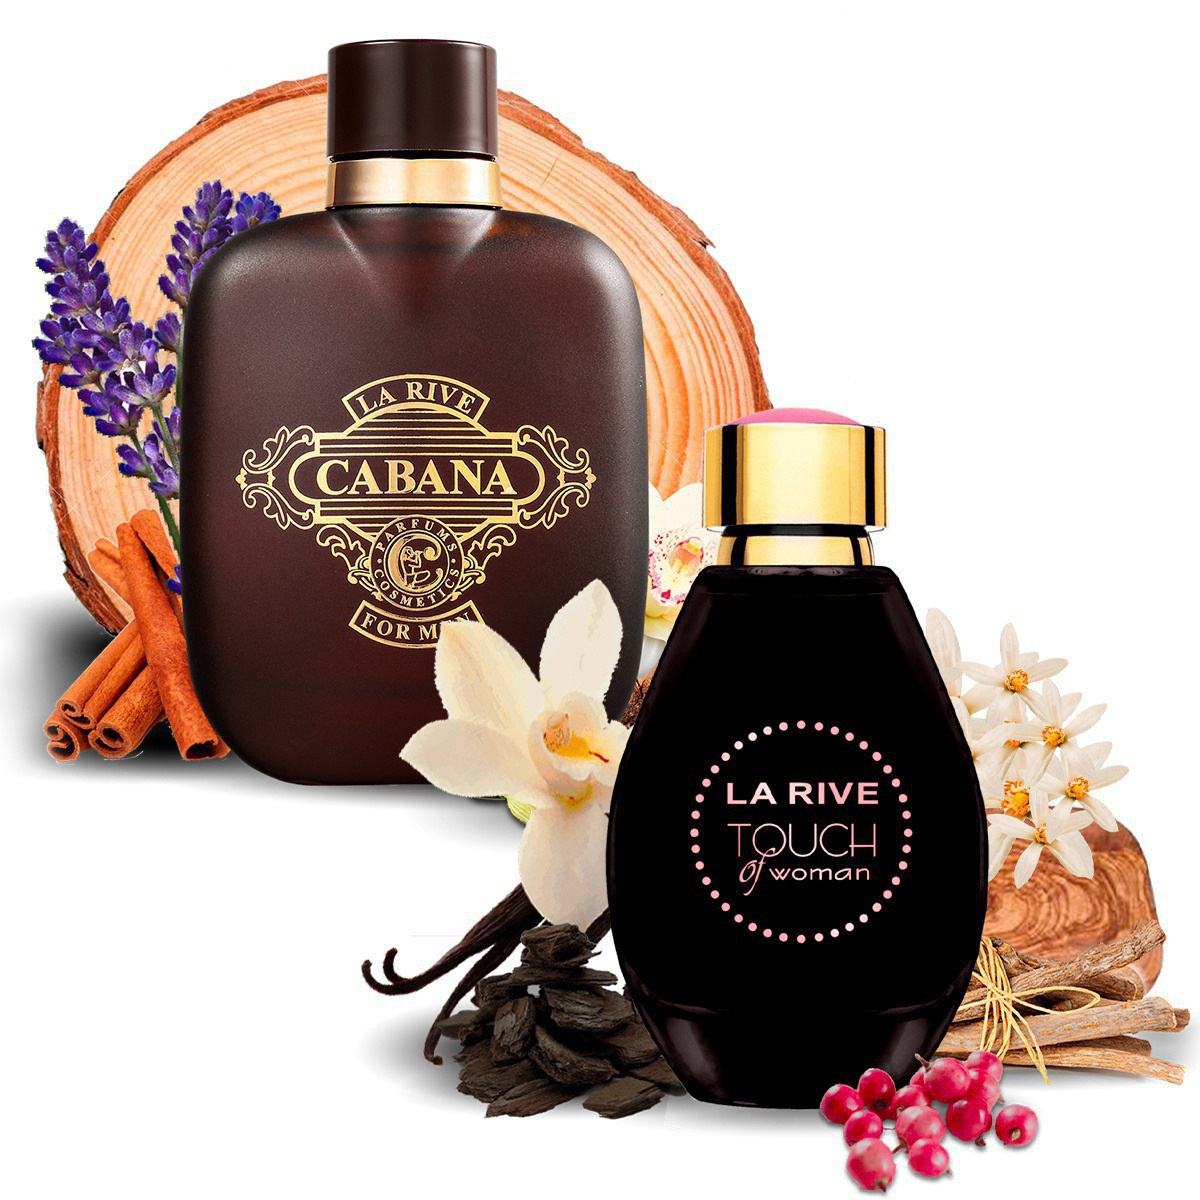 Kit 2 Perfumes Importados Cabana e Touch of Woman La Rive